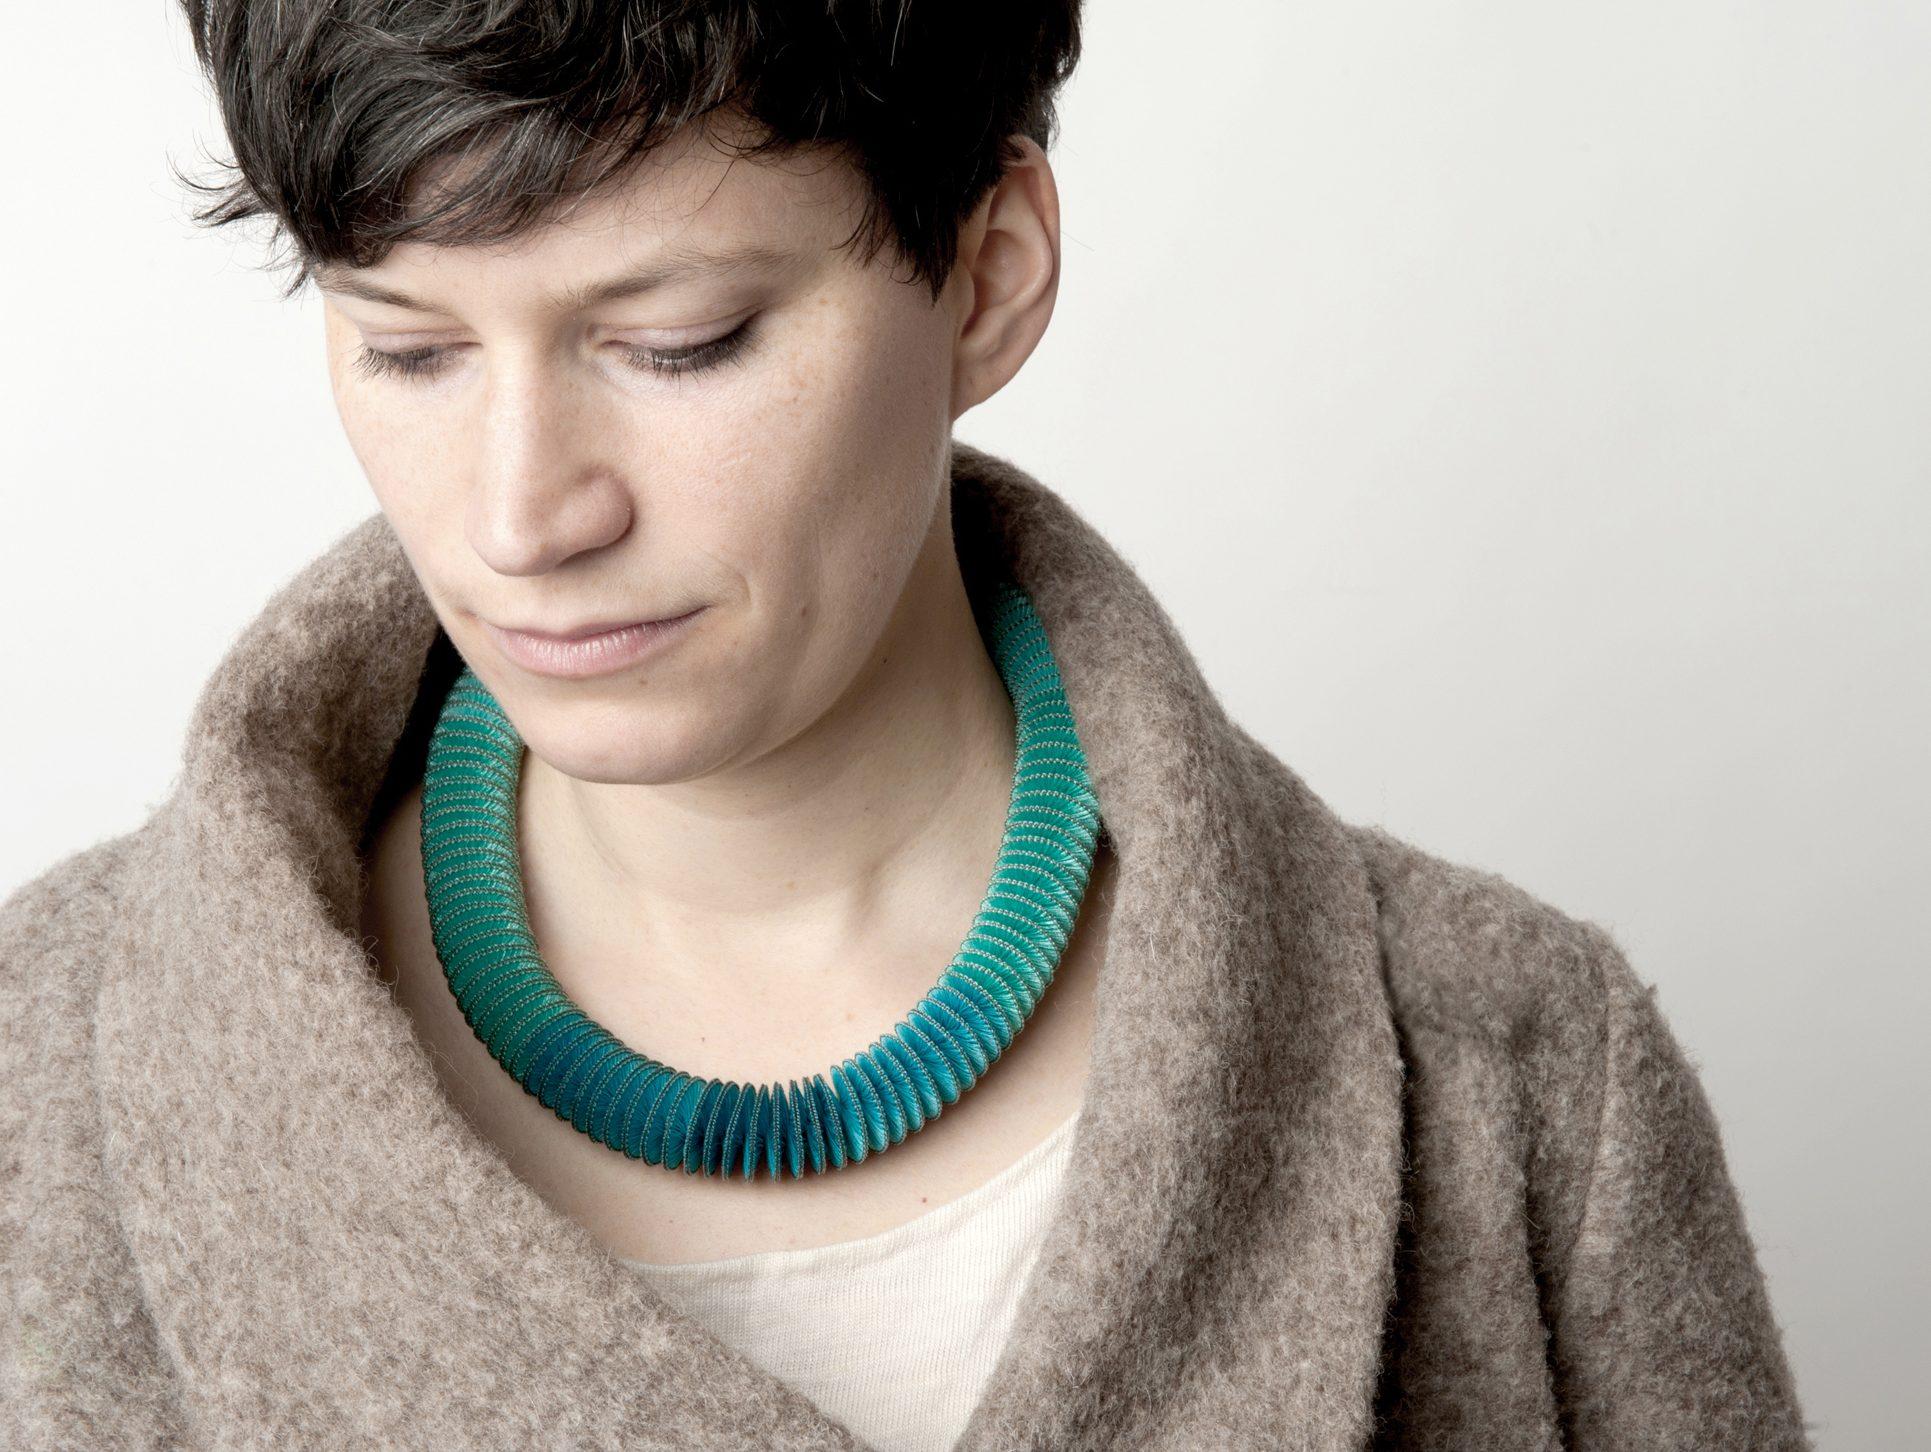 Anke Hennig, Basic I, halssieraad. Foto met dank aan Anke Hennig©